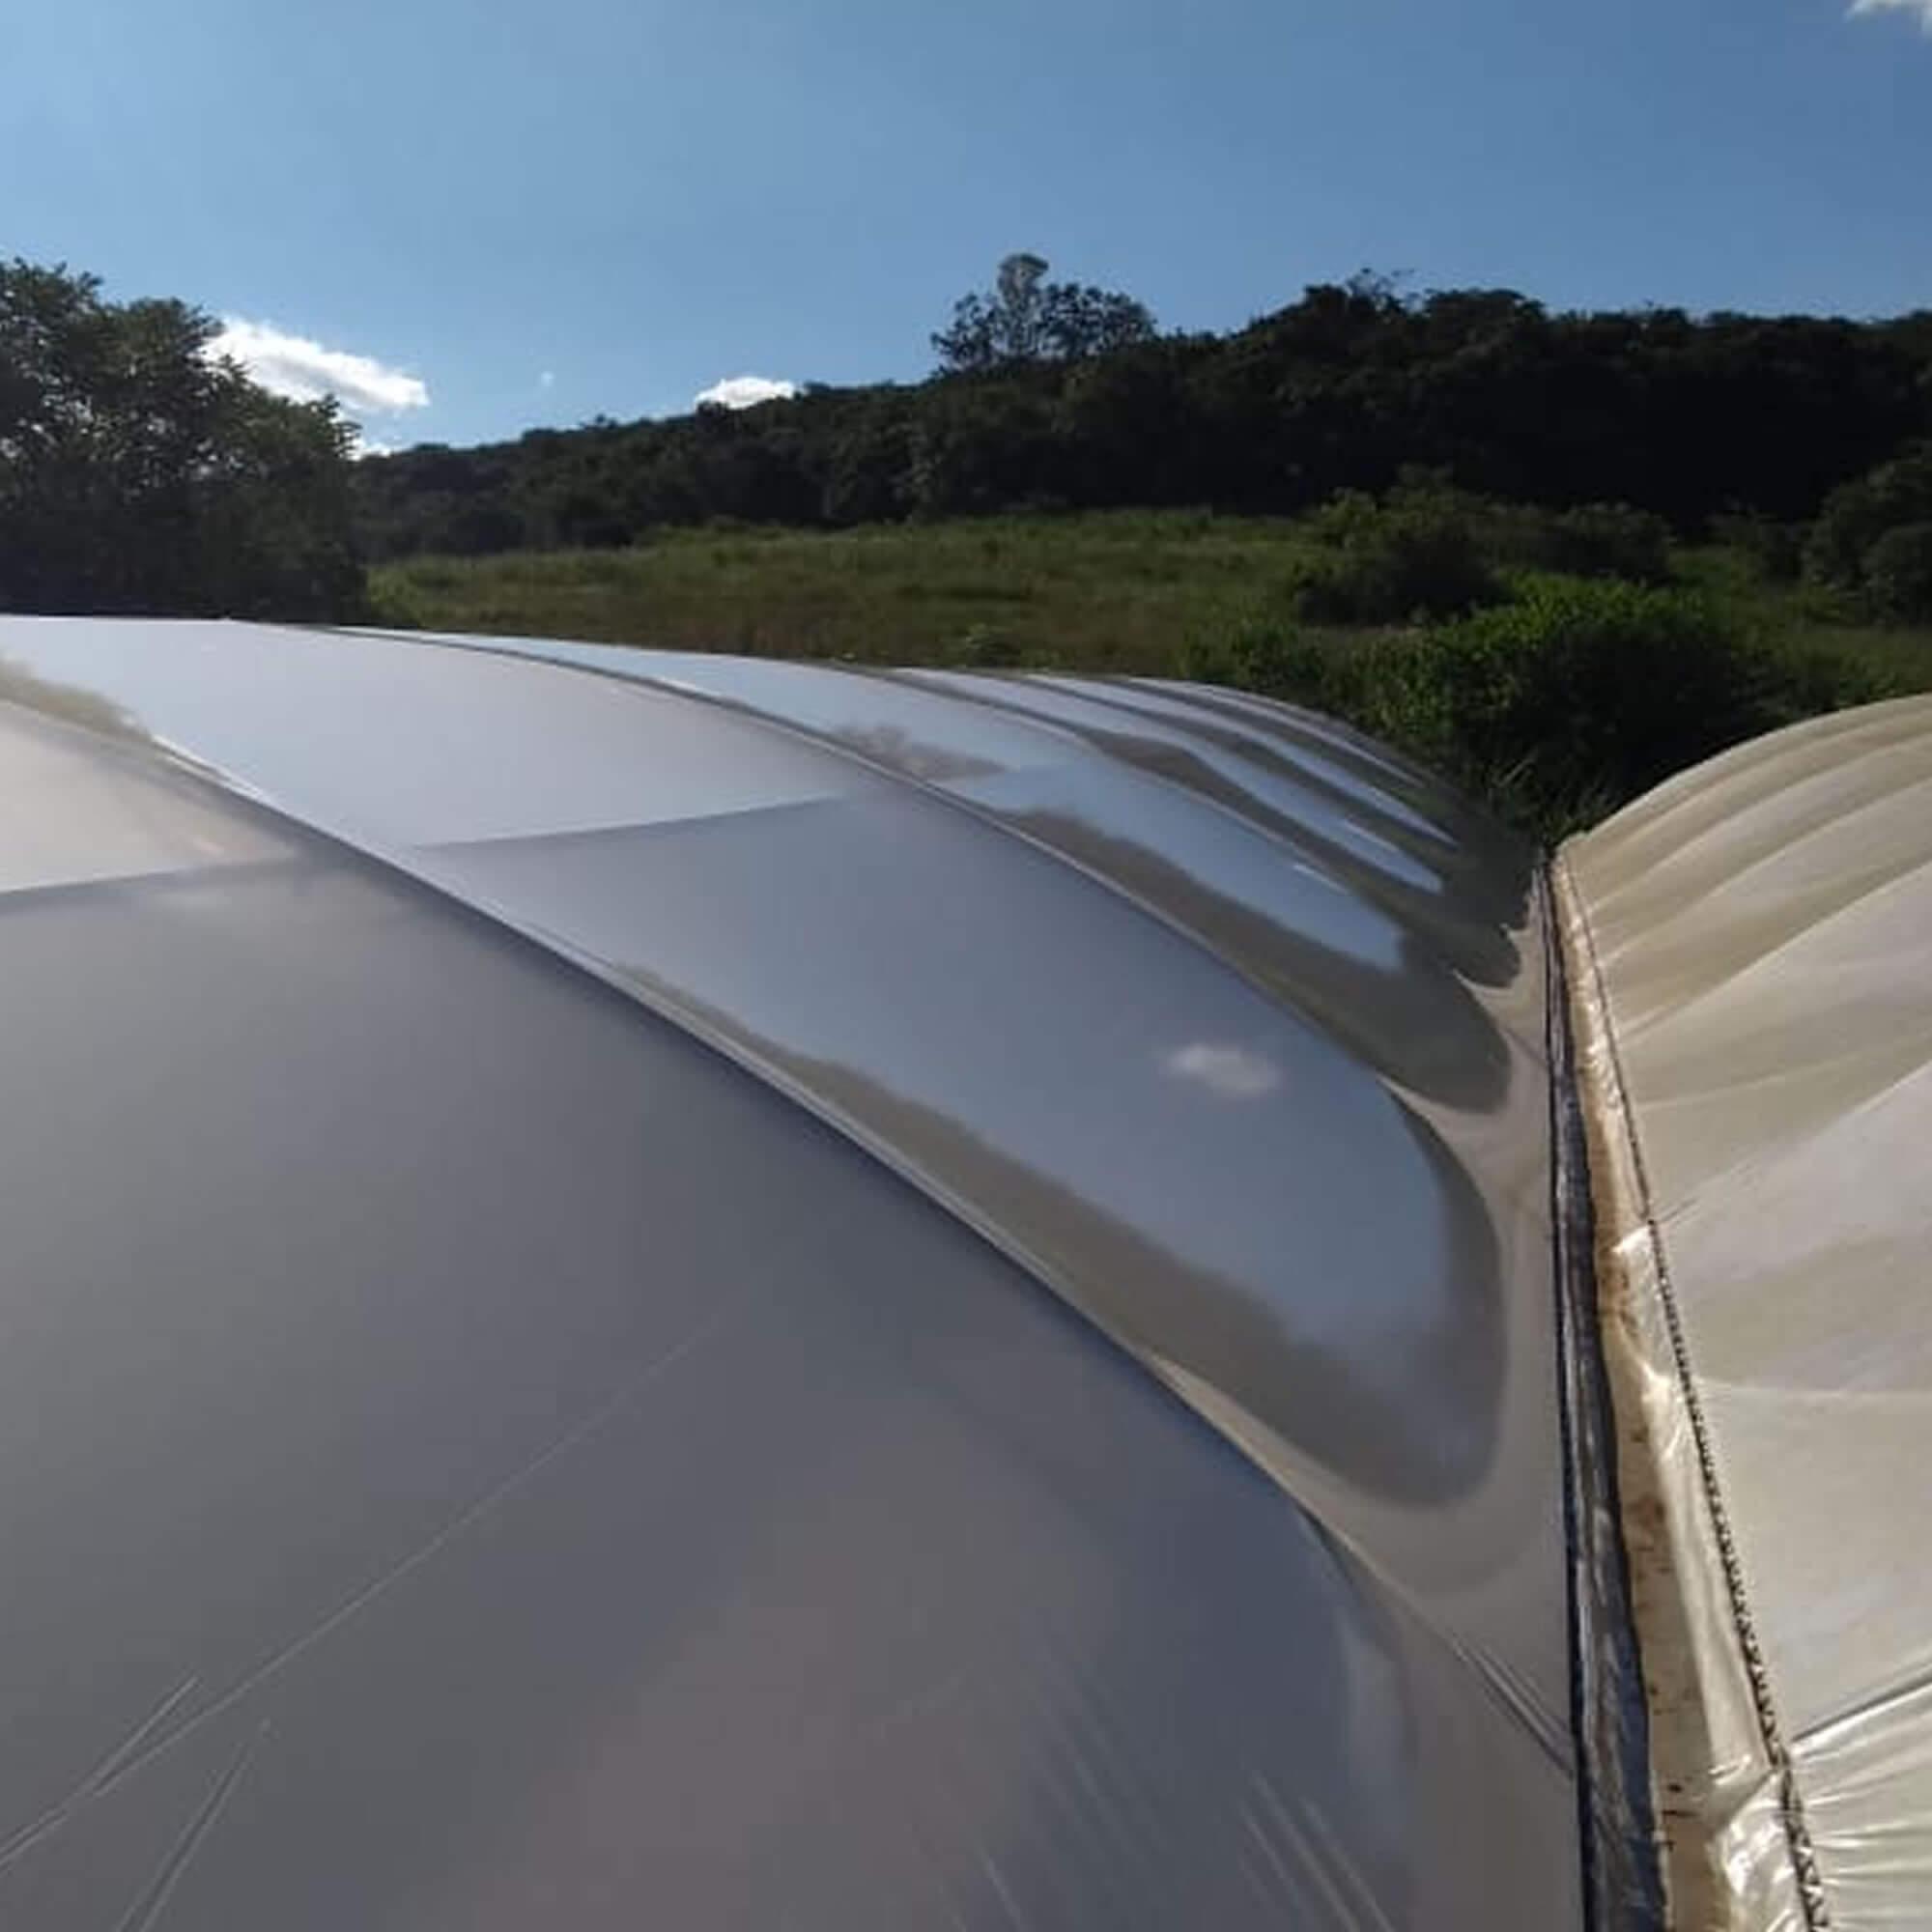 Filme Plástico Difusor para Estufa - 4 metros - 90 micras - Politiv